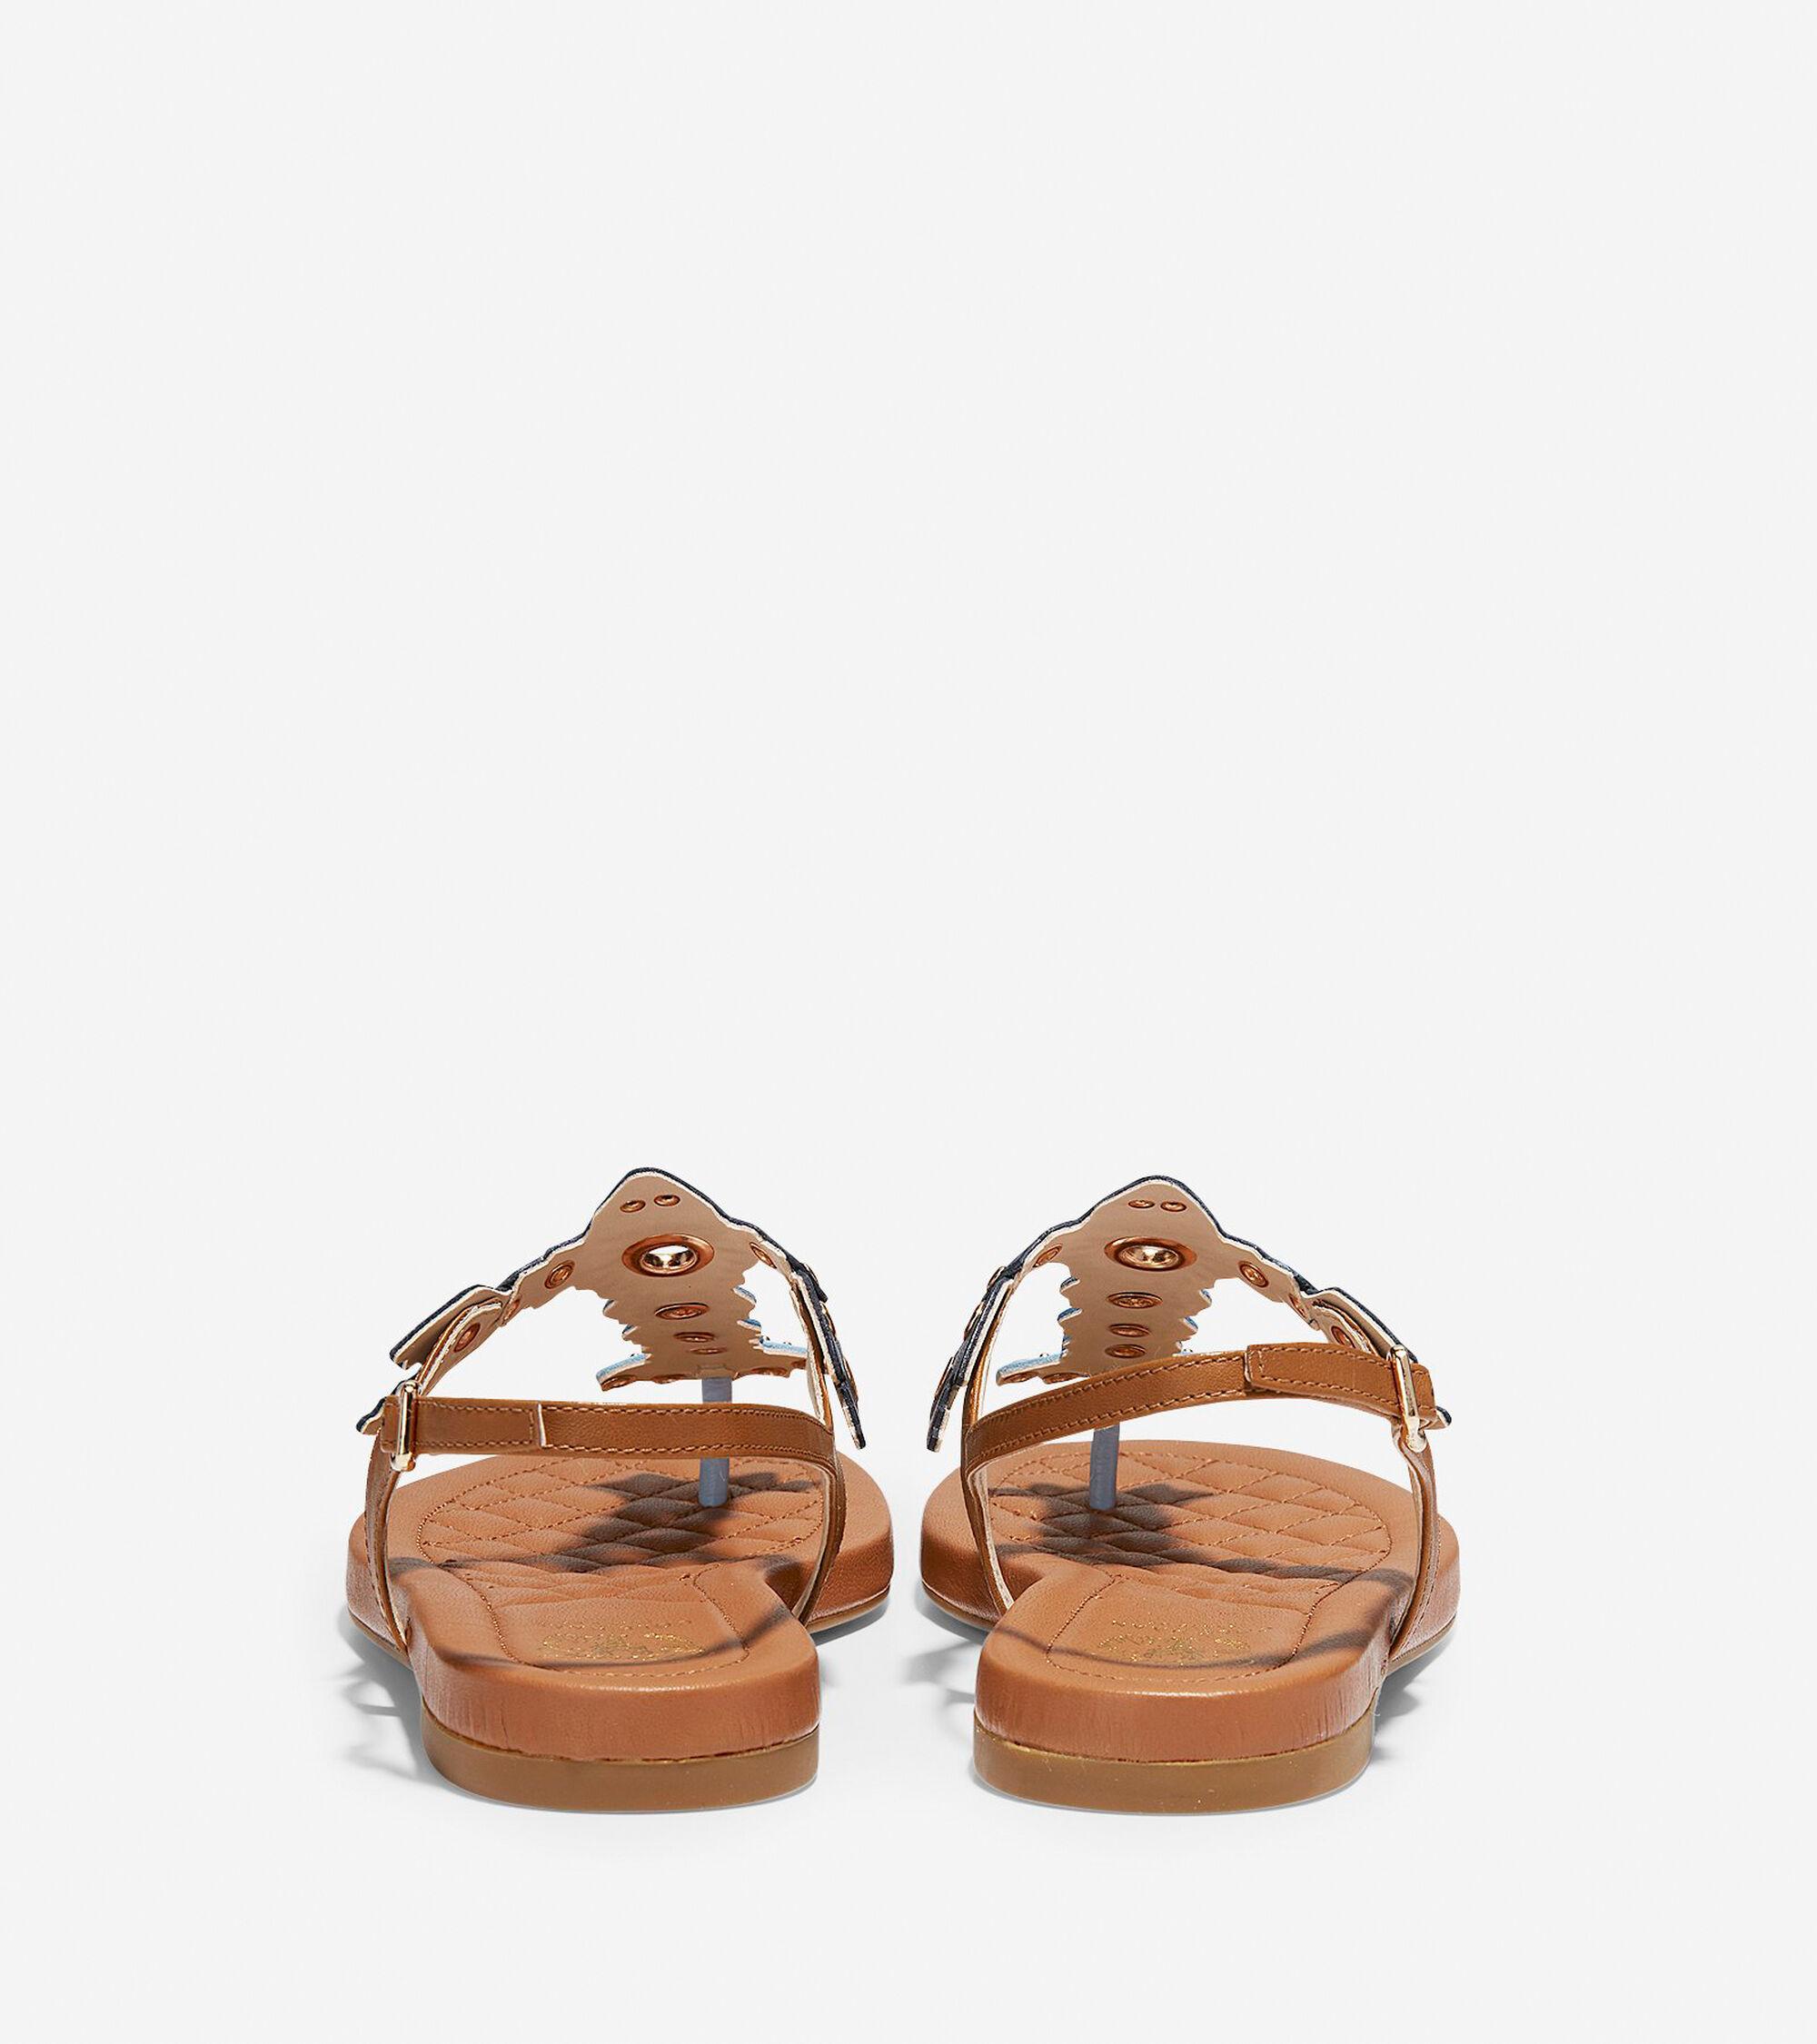 Womens Pinch Lobster Sandals In Blue Cole Haan Tendencies Footbed 2 Strap Brown 42 Sandal